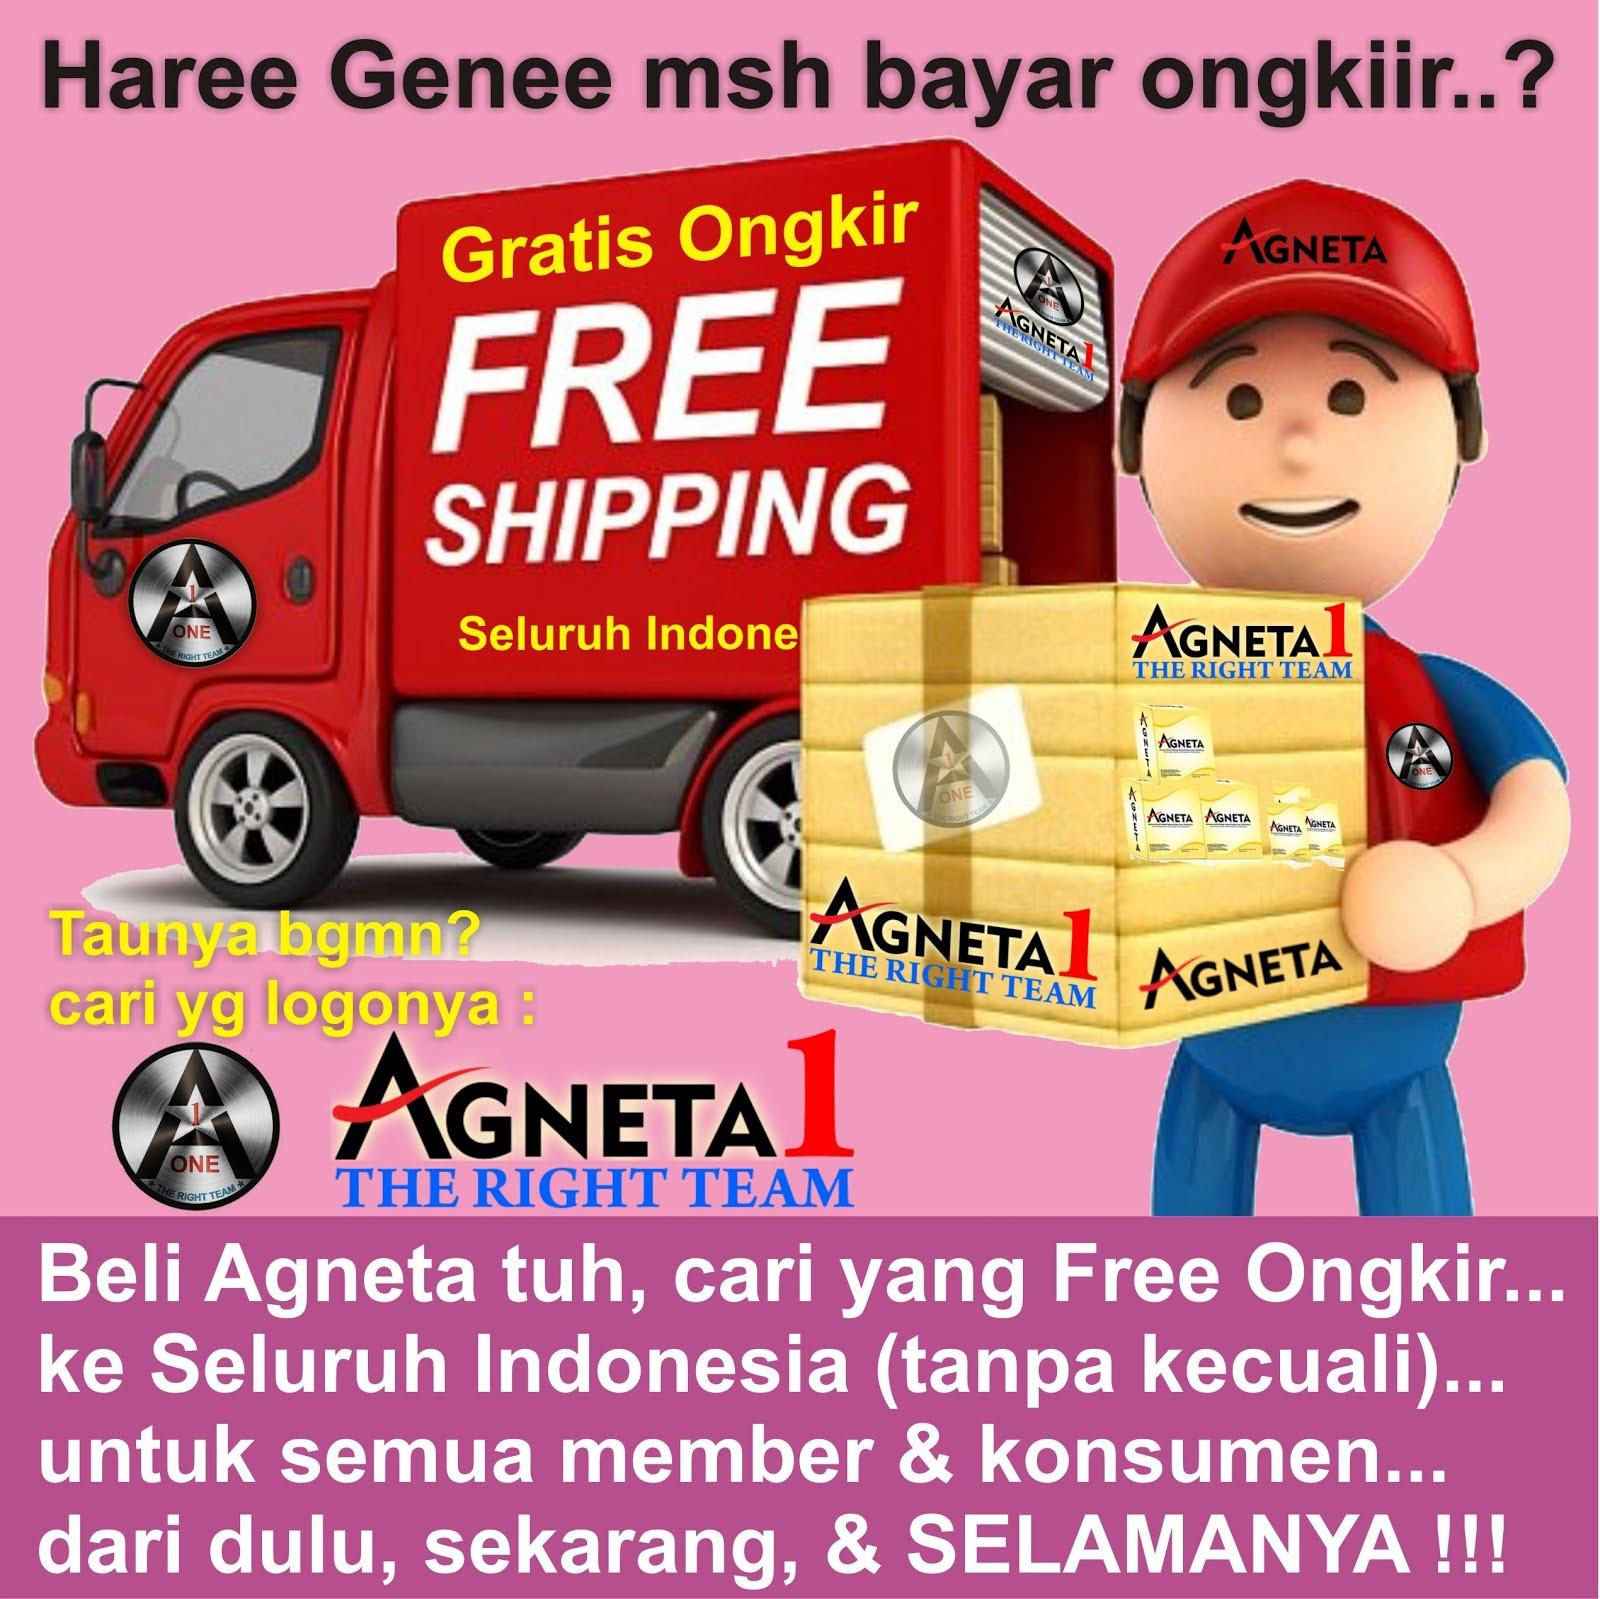 Beli Agneta Free Ongkir Seluruh Indonesia